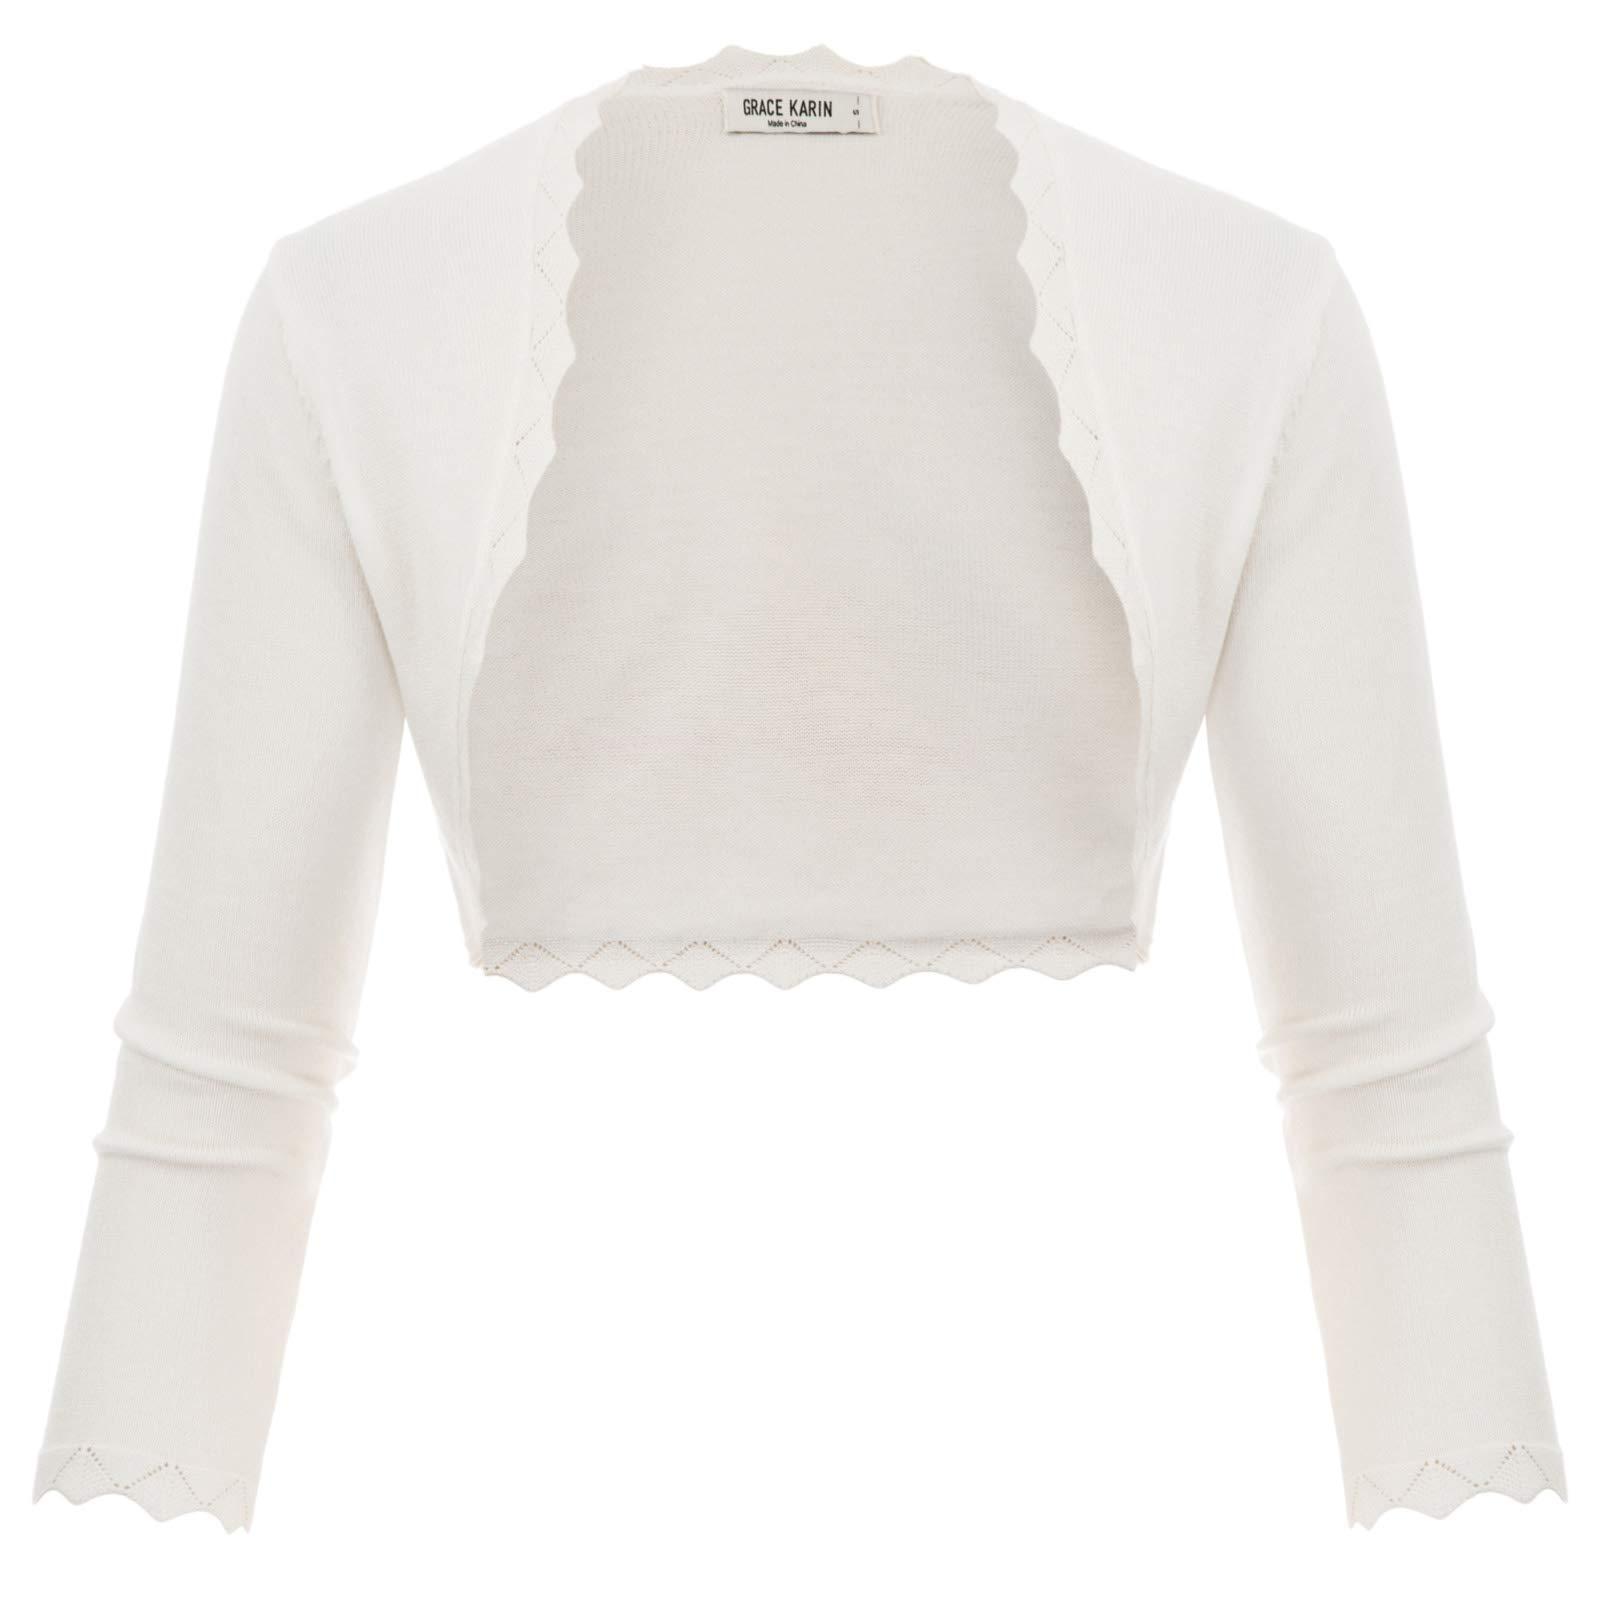 16abe425e3d GRACE KARIN Women's 3/4 Sleeve Open Front Scalloped Knit Cropped Bolero  Shrug Cardigan · Women's Shrug Sweaters